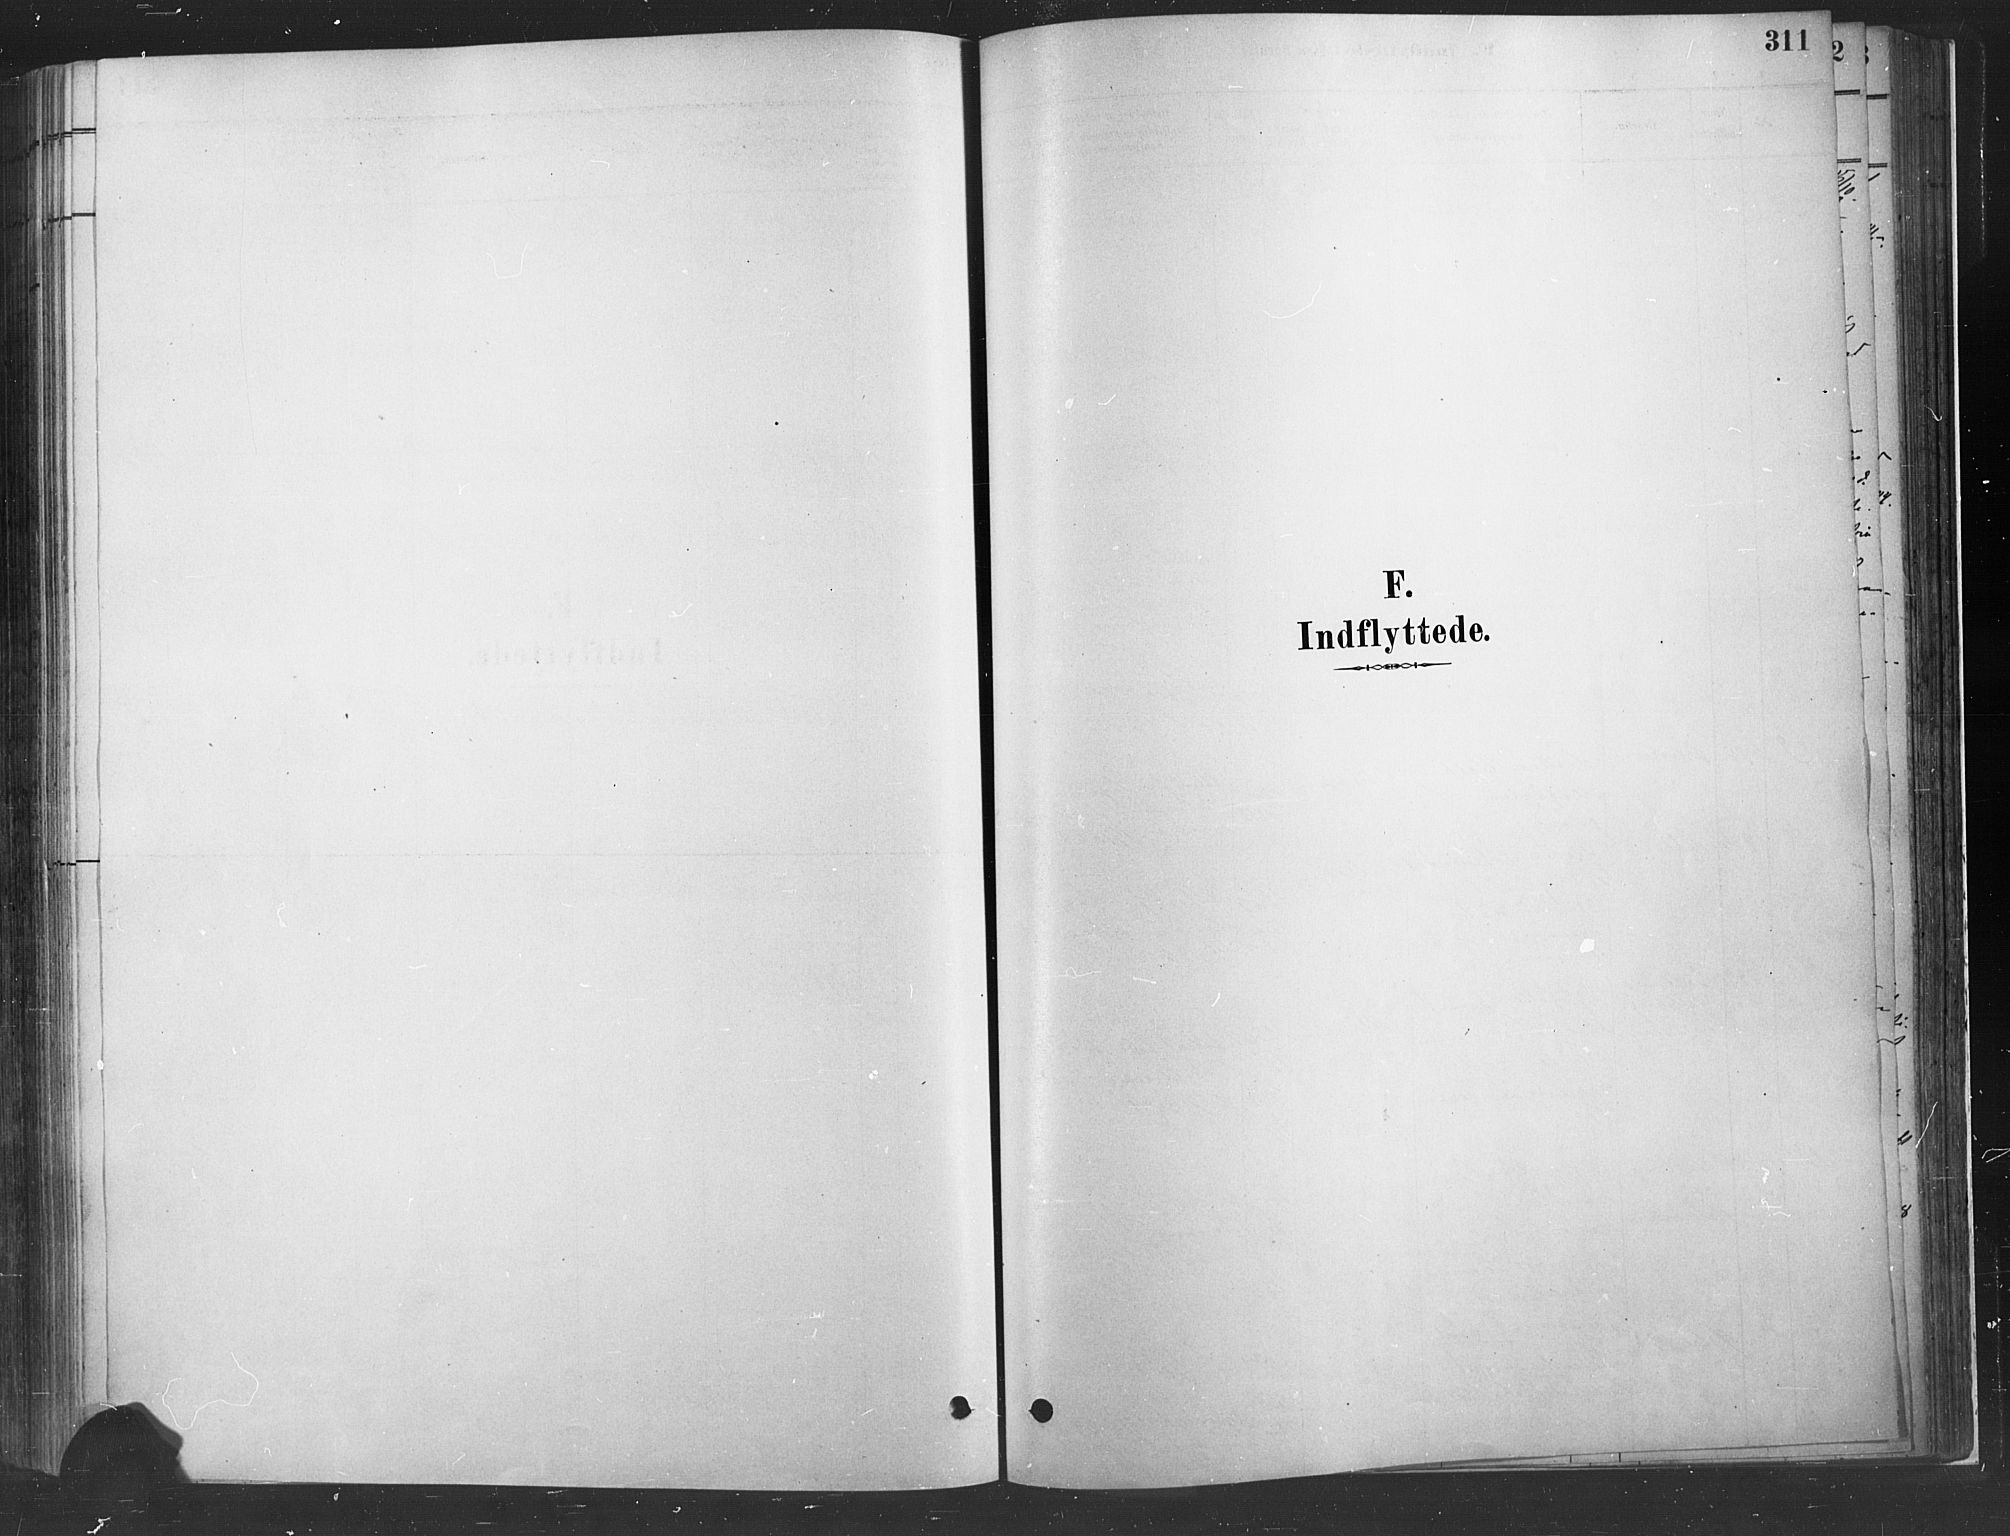 SAH, Fåberg prestekontor, H/Ha/Haa/L0010: Parish register (official) no. 10, 1879-1900, p. 311